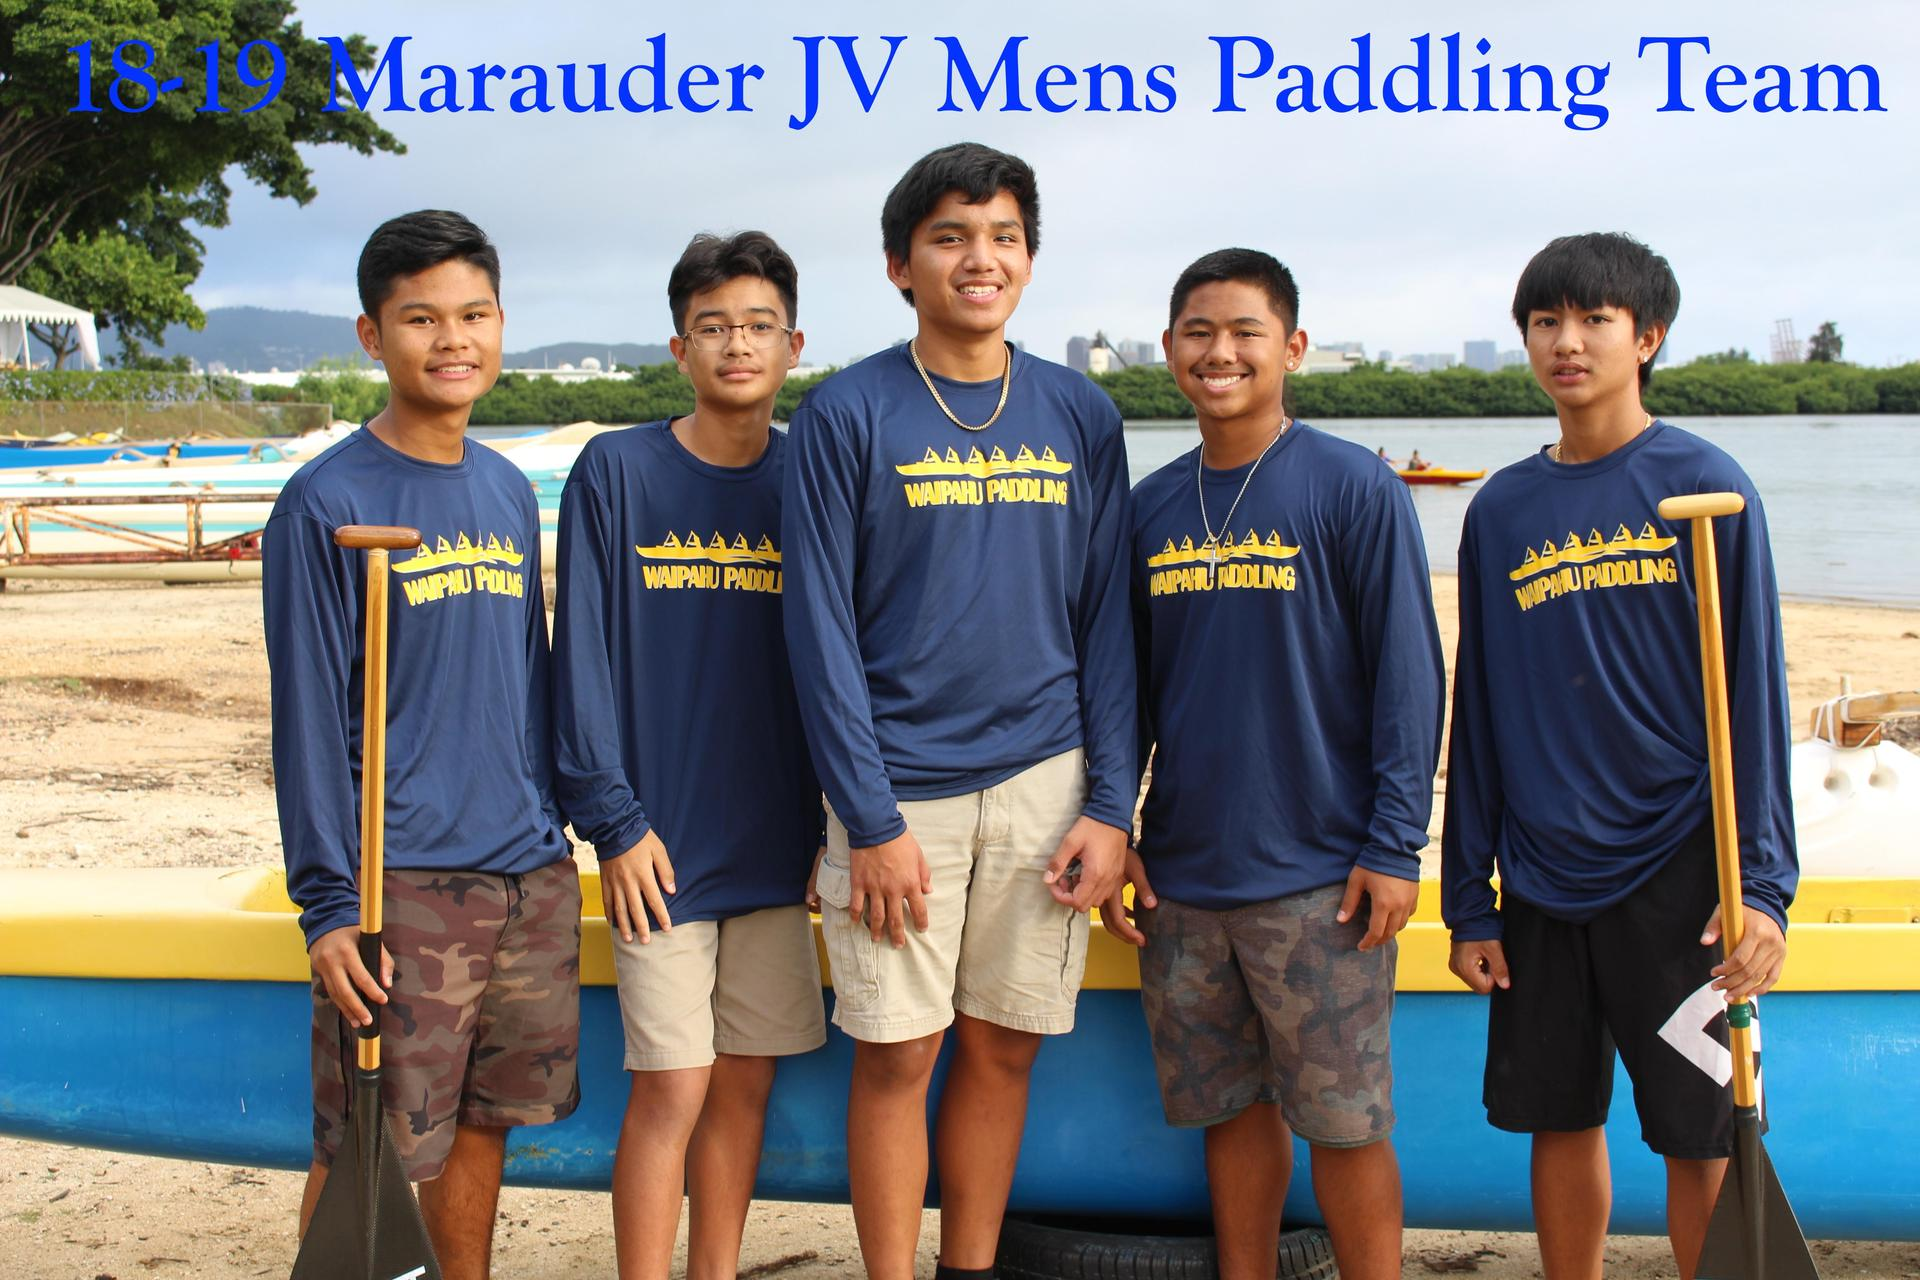 Paddling Boys JV